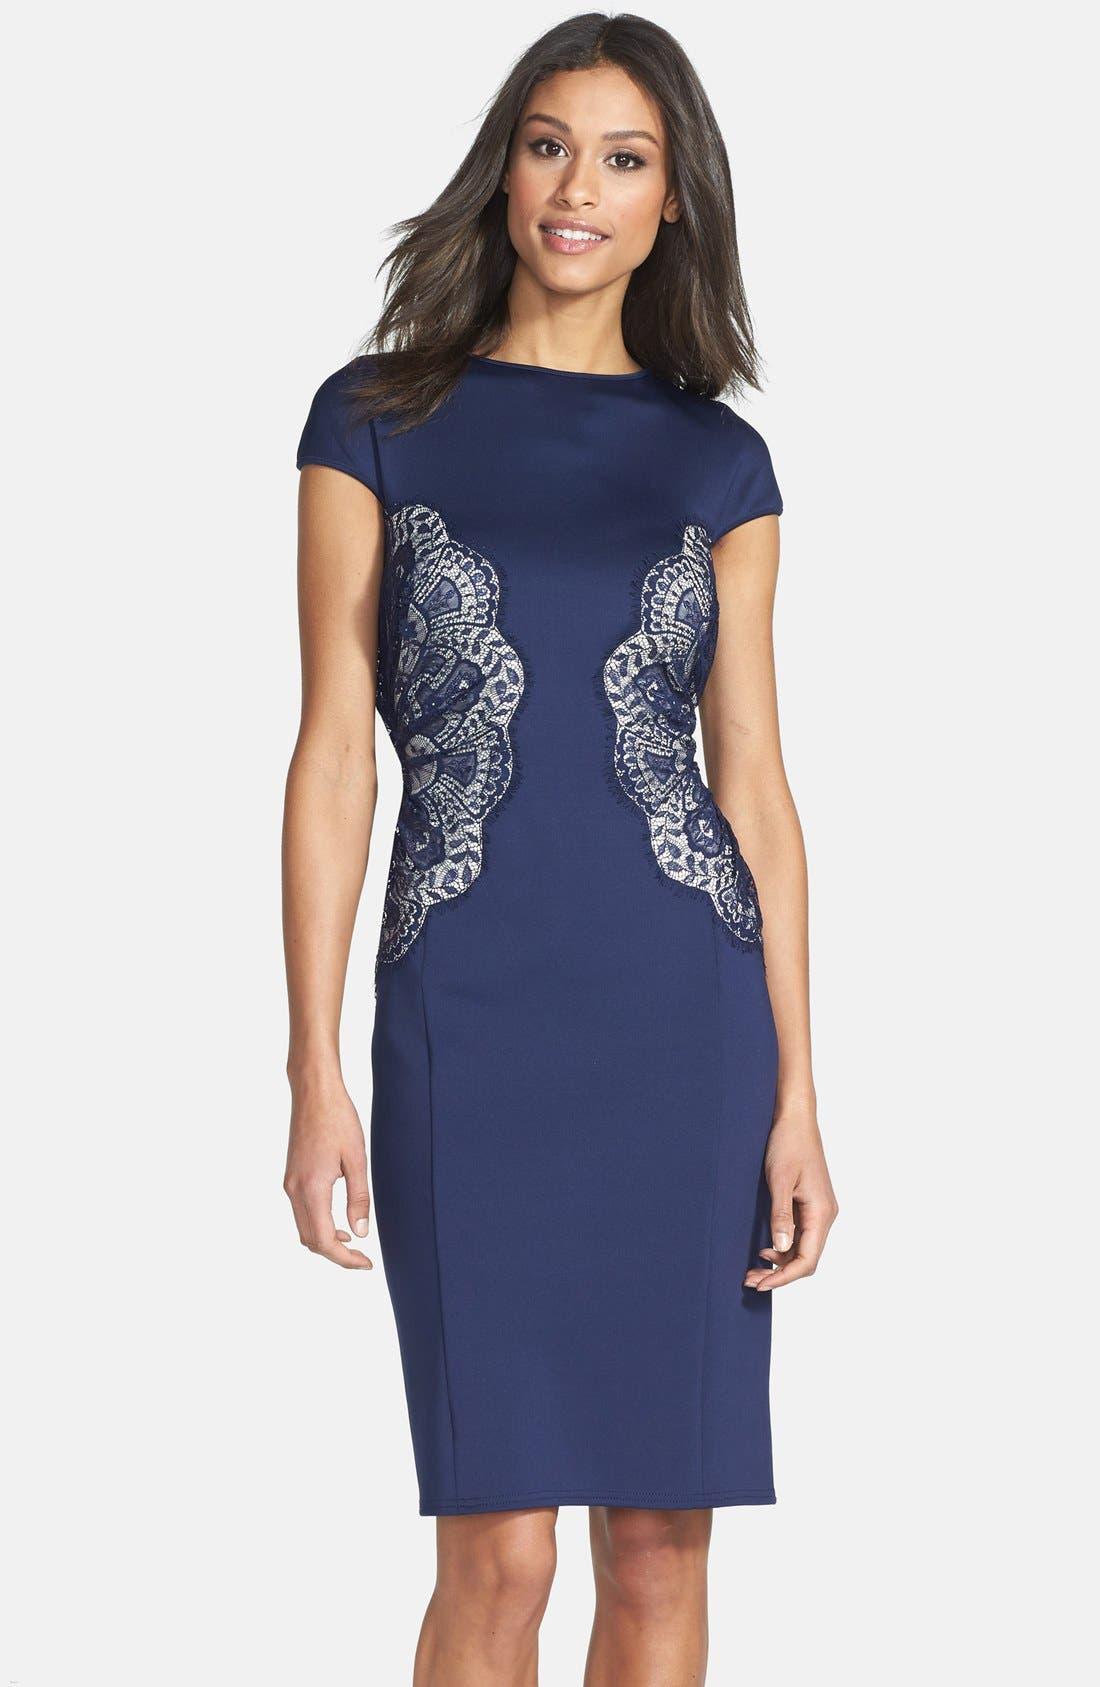 Alternate Image 1 Selected - Tadashi Shoji Lace Inset Jersey Dress